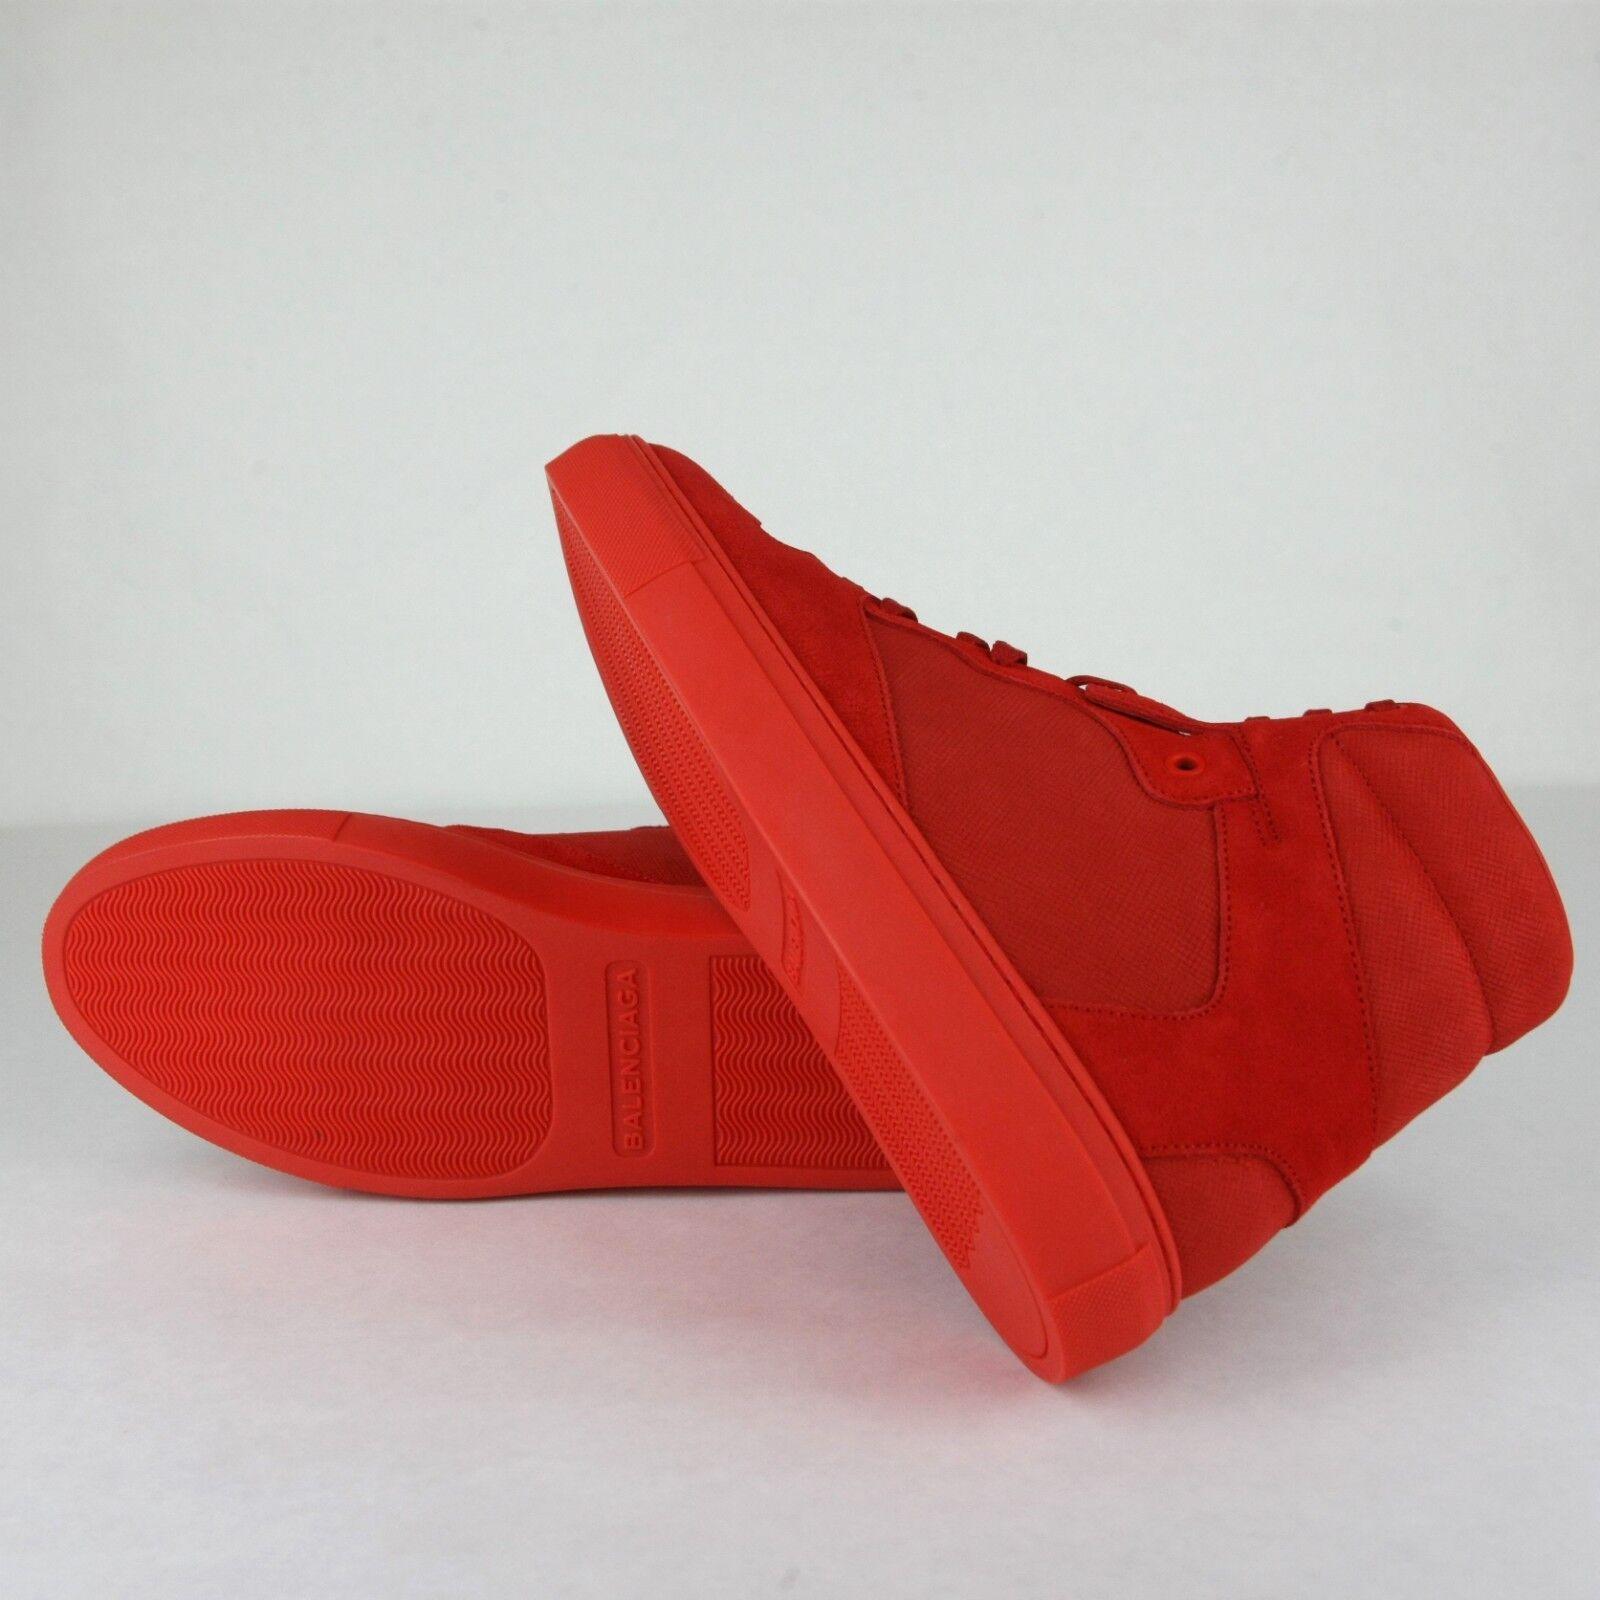 [CP9366] Adidas Yeezy Boost 350 2018 V2 Crema Triple Blanco Kanye 100% Auténtico 2018 350 6c883d